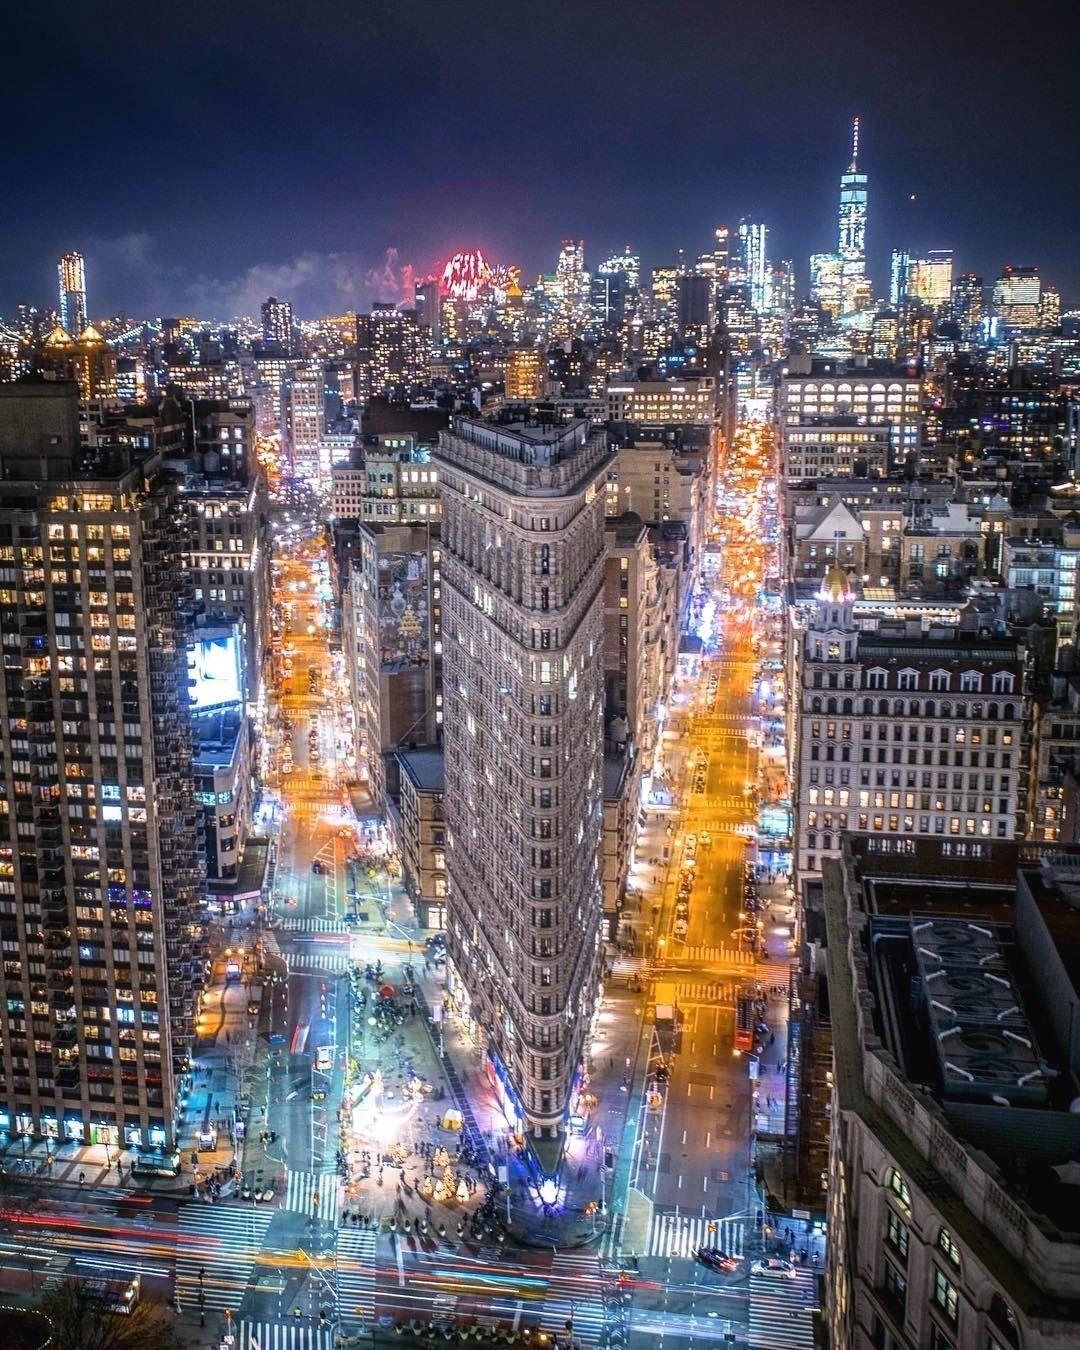 Pin By Ashkan Aliyar On New York City Photography City New York City